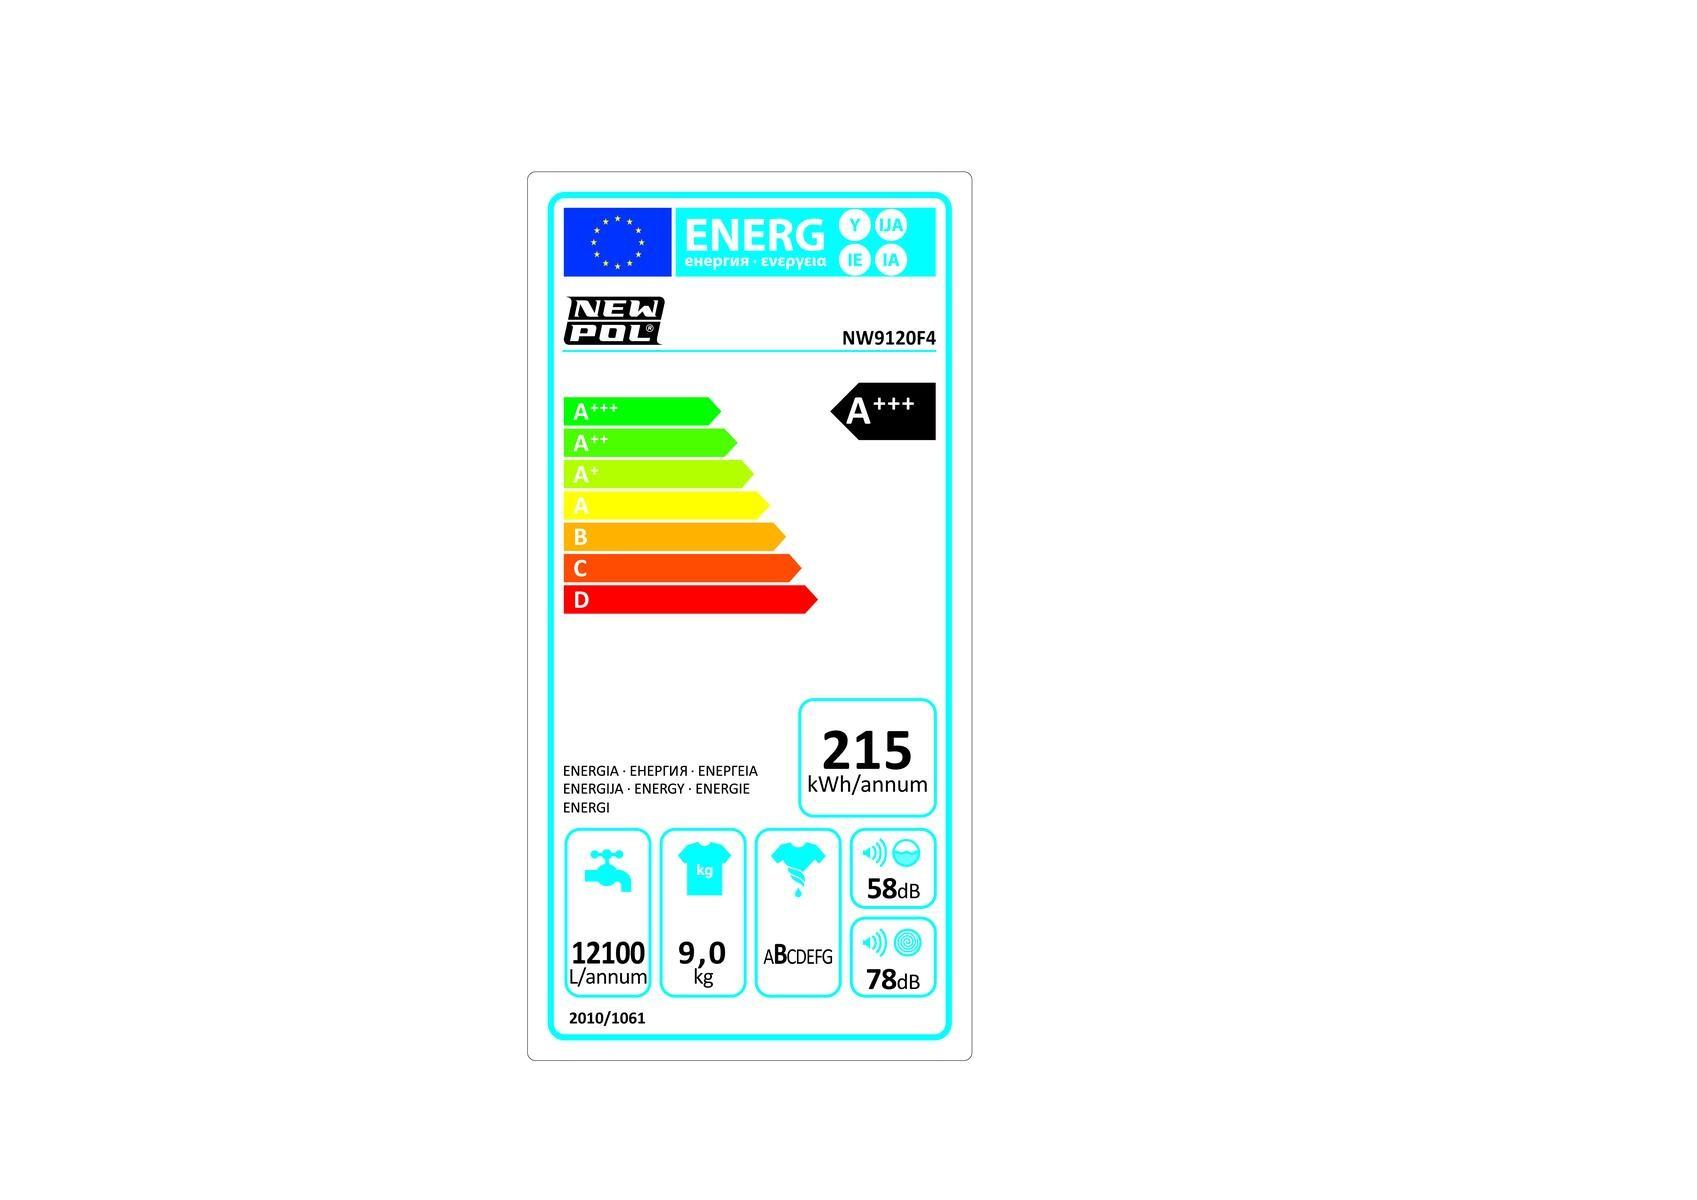 Etiqueta de Eficiencia Energética - NW9120F4